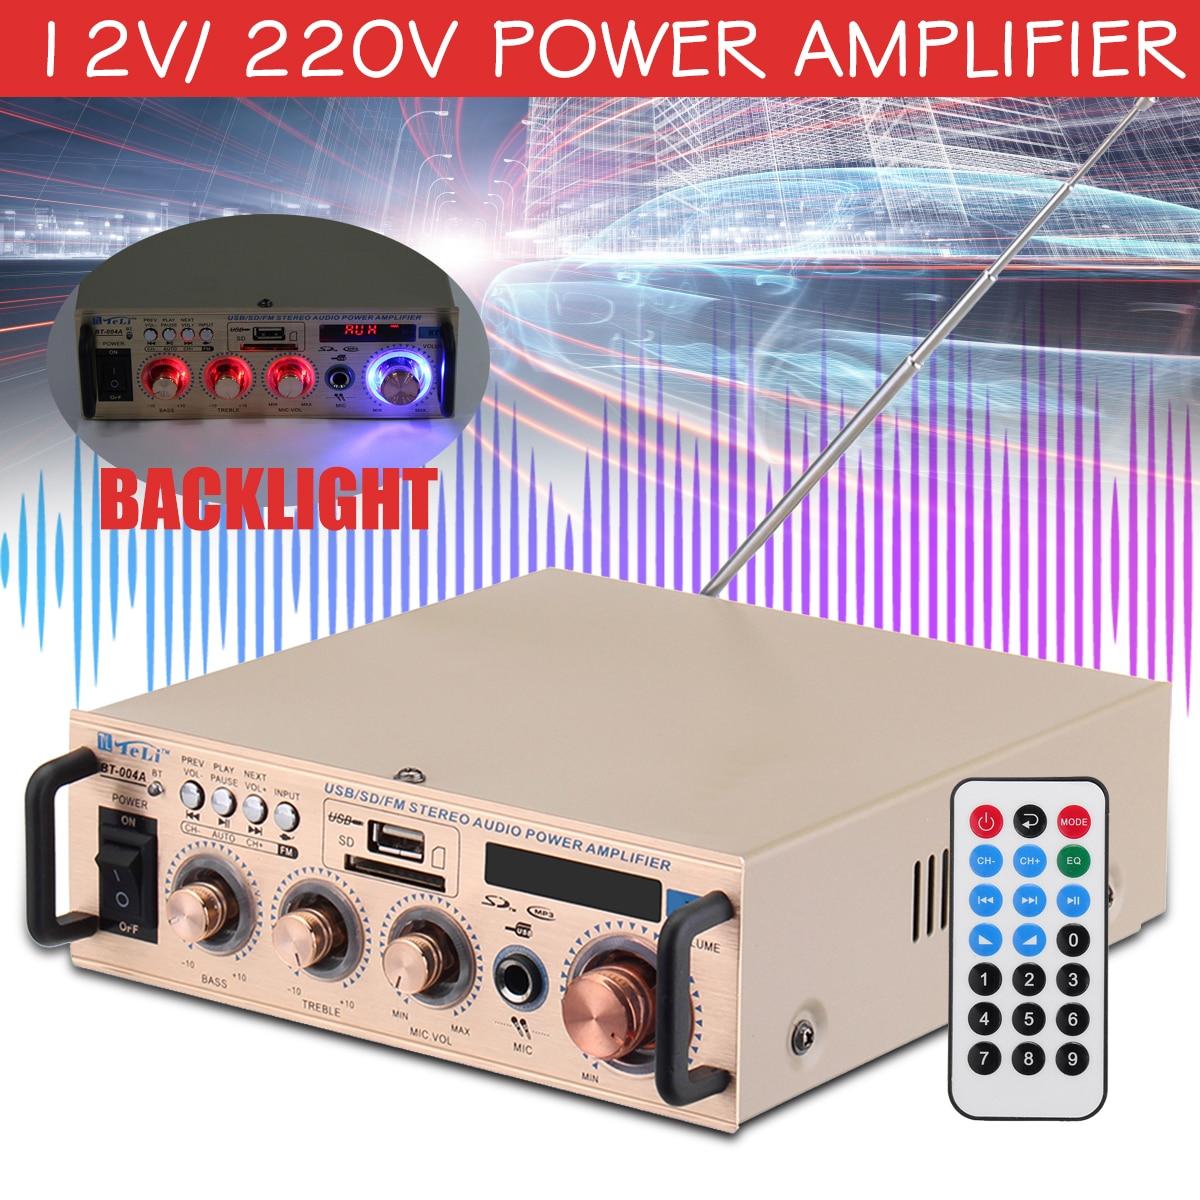 12V/ 220V HIFI Audio Stereo Power Amplifier Bass FM Radio 2CH Audio